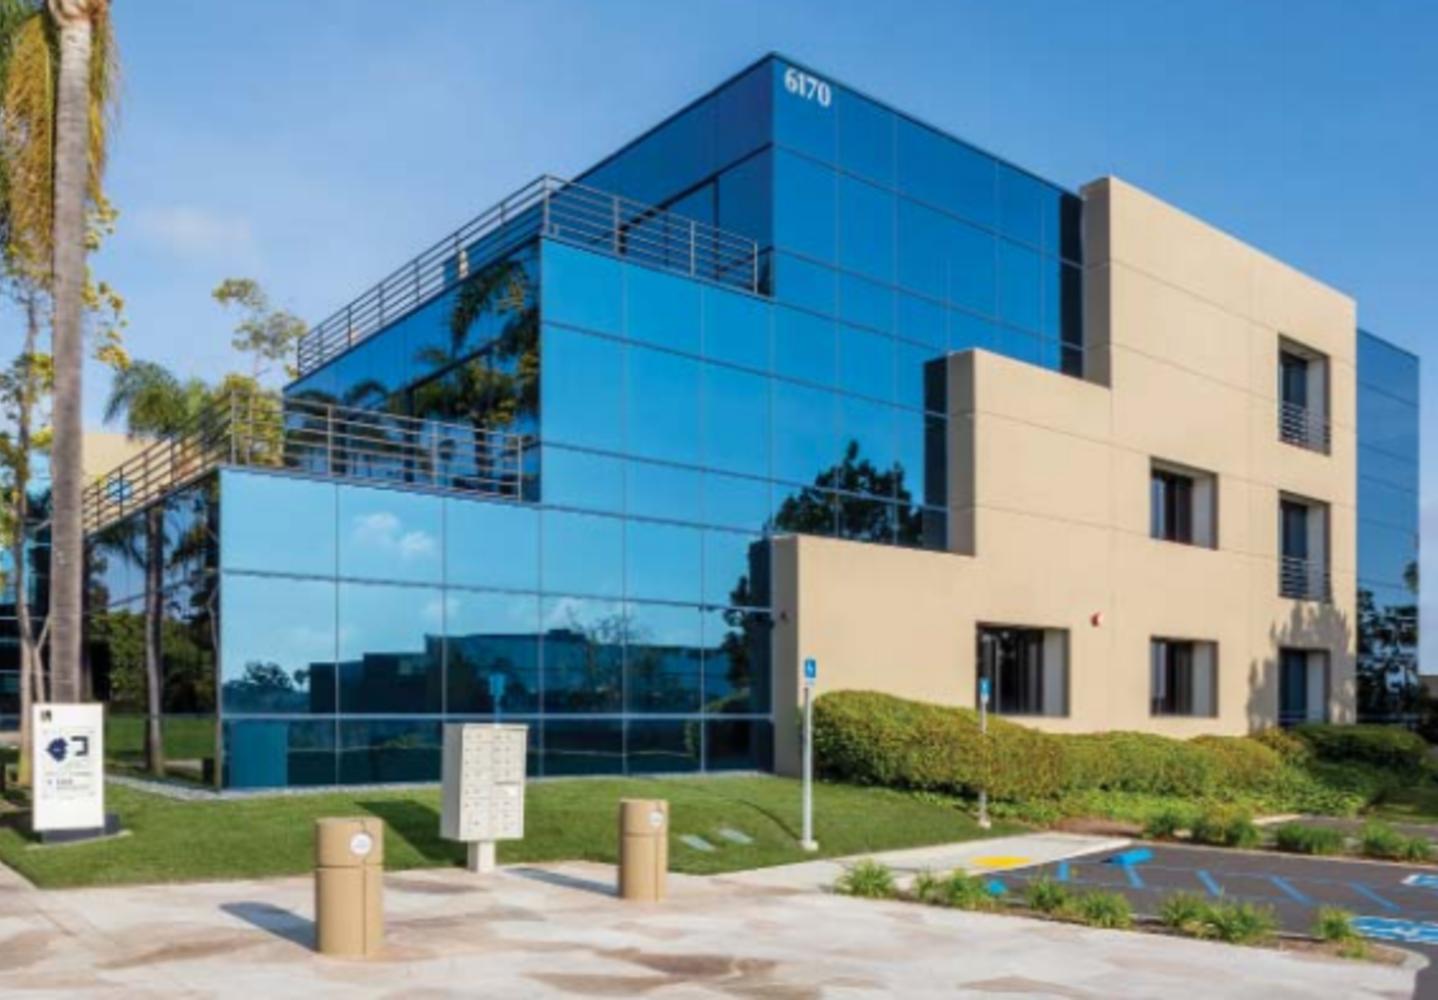 Office San diego, 92121 - 6170 Cornerstone Ct E